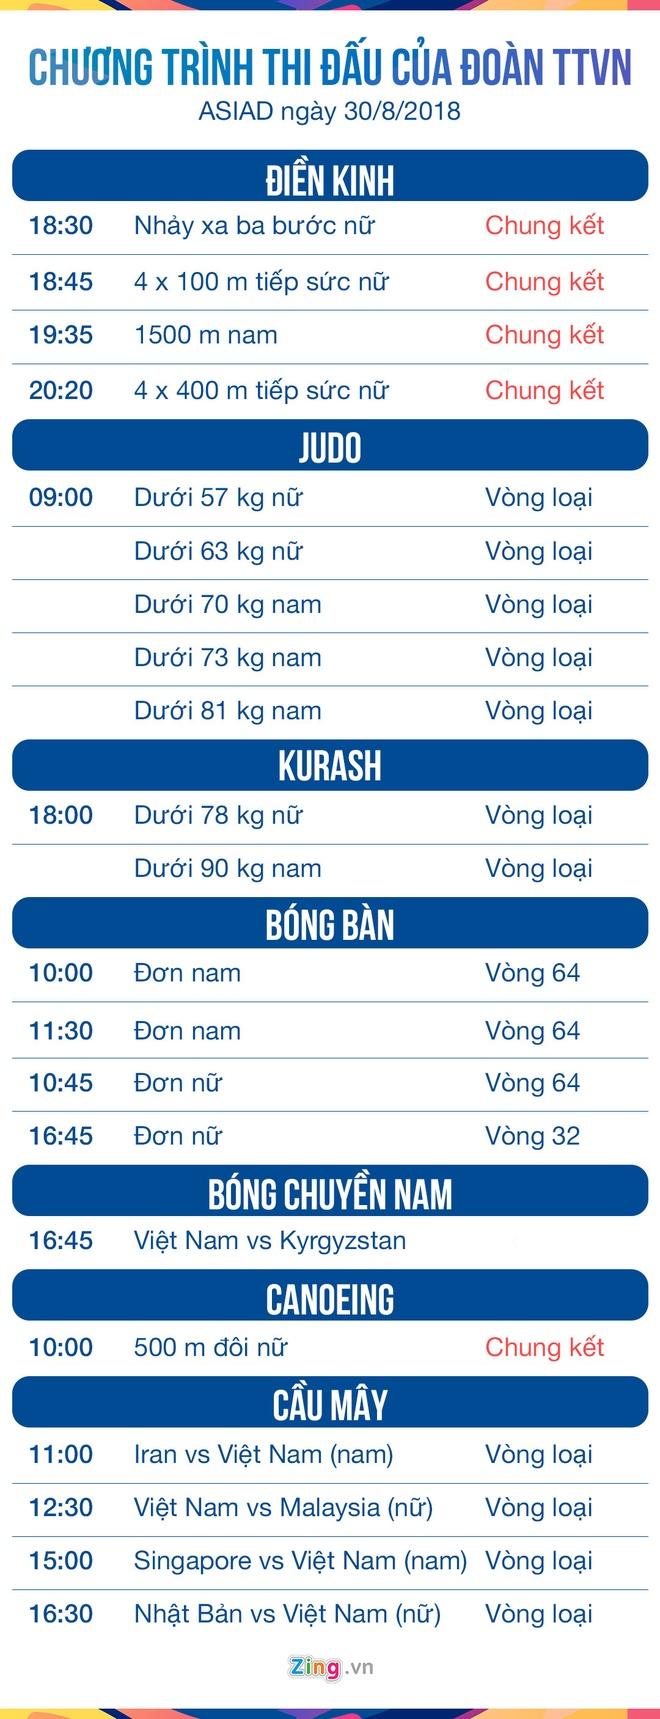 ASIAD ngay 30/8: Doi tuyen dien kinh Viet Nam lien tiep co them 2 HCD hinh anh 1